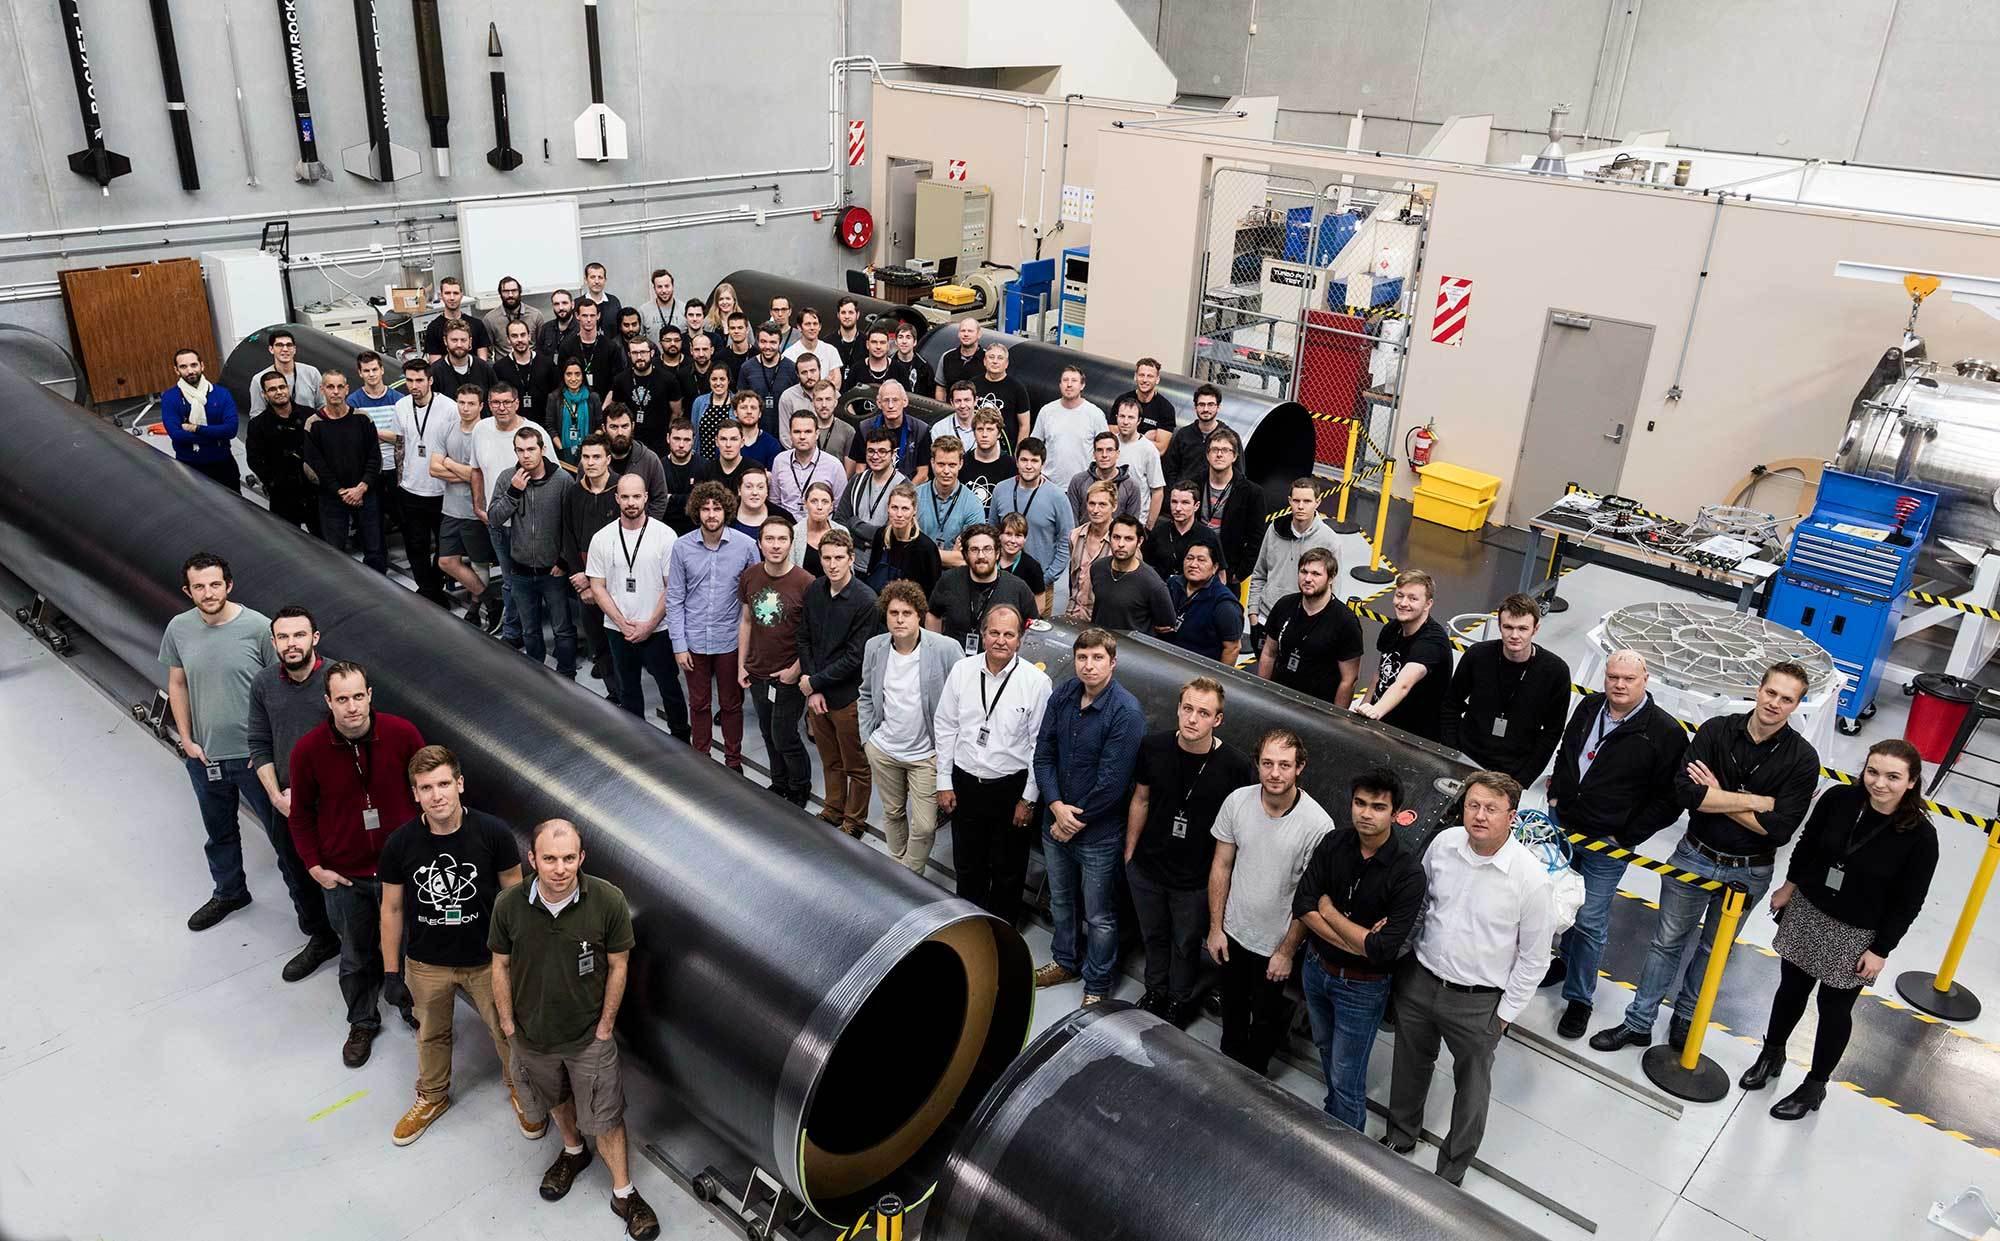 Zaměstnanci firmy Rocket lab. Zdroj: http://spaceflight101.com/